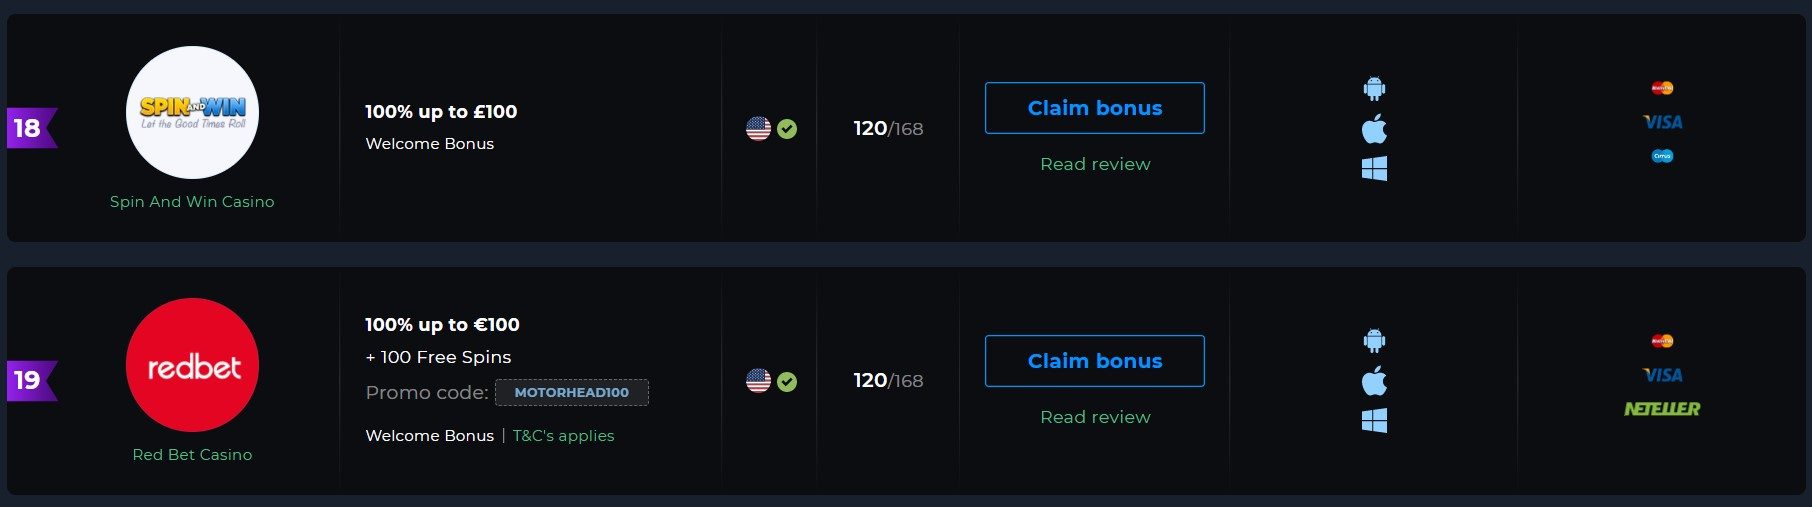 How to Claim 5000 Free Spins Bonus